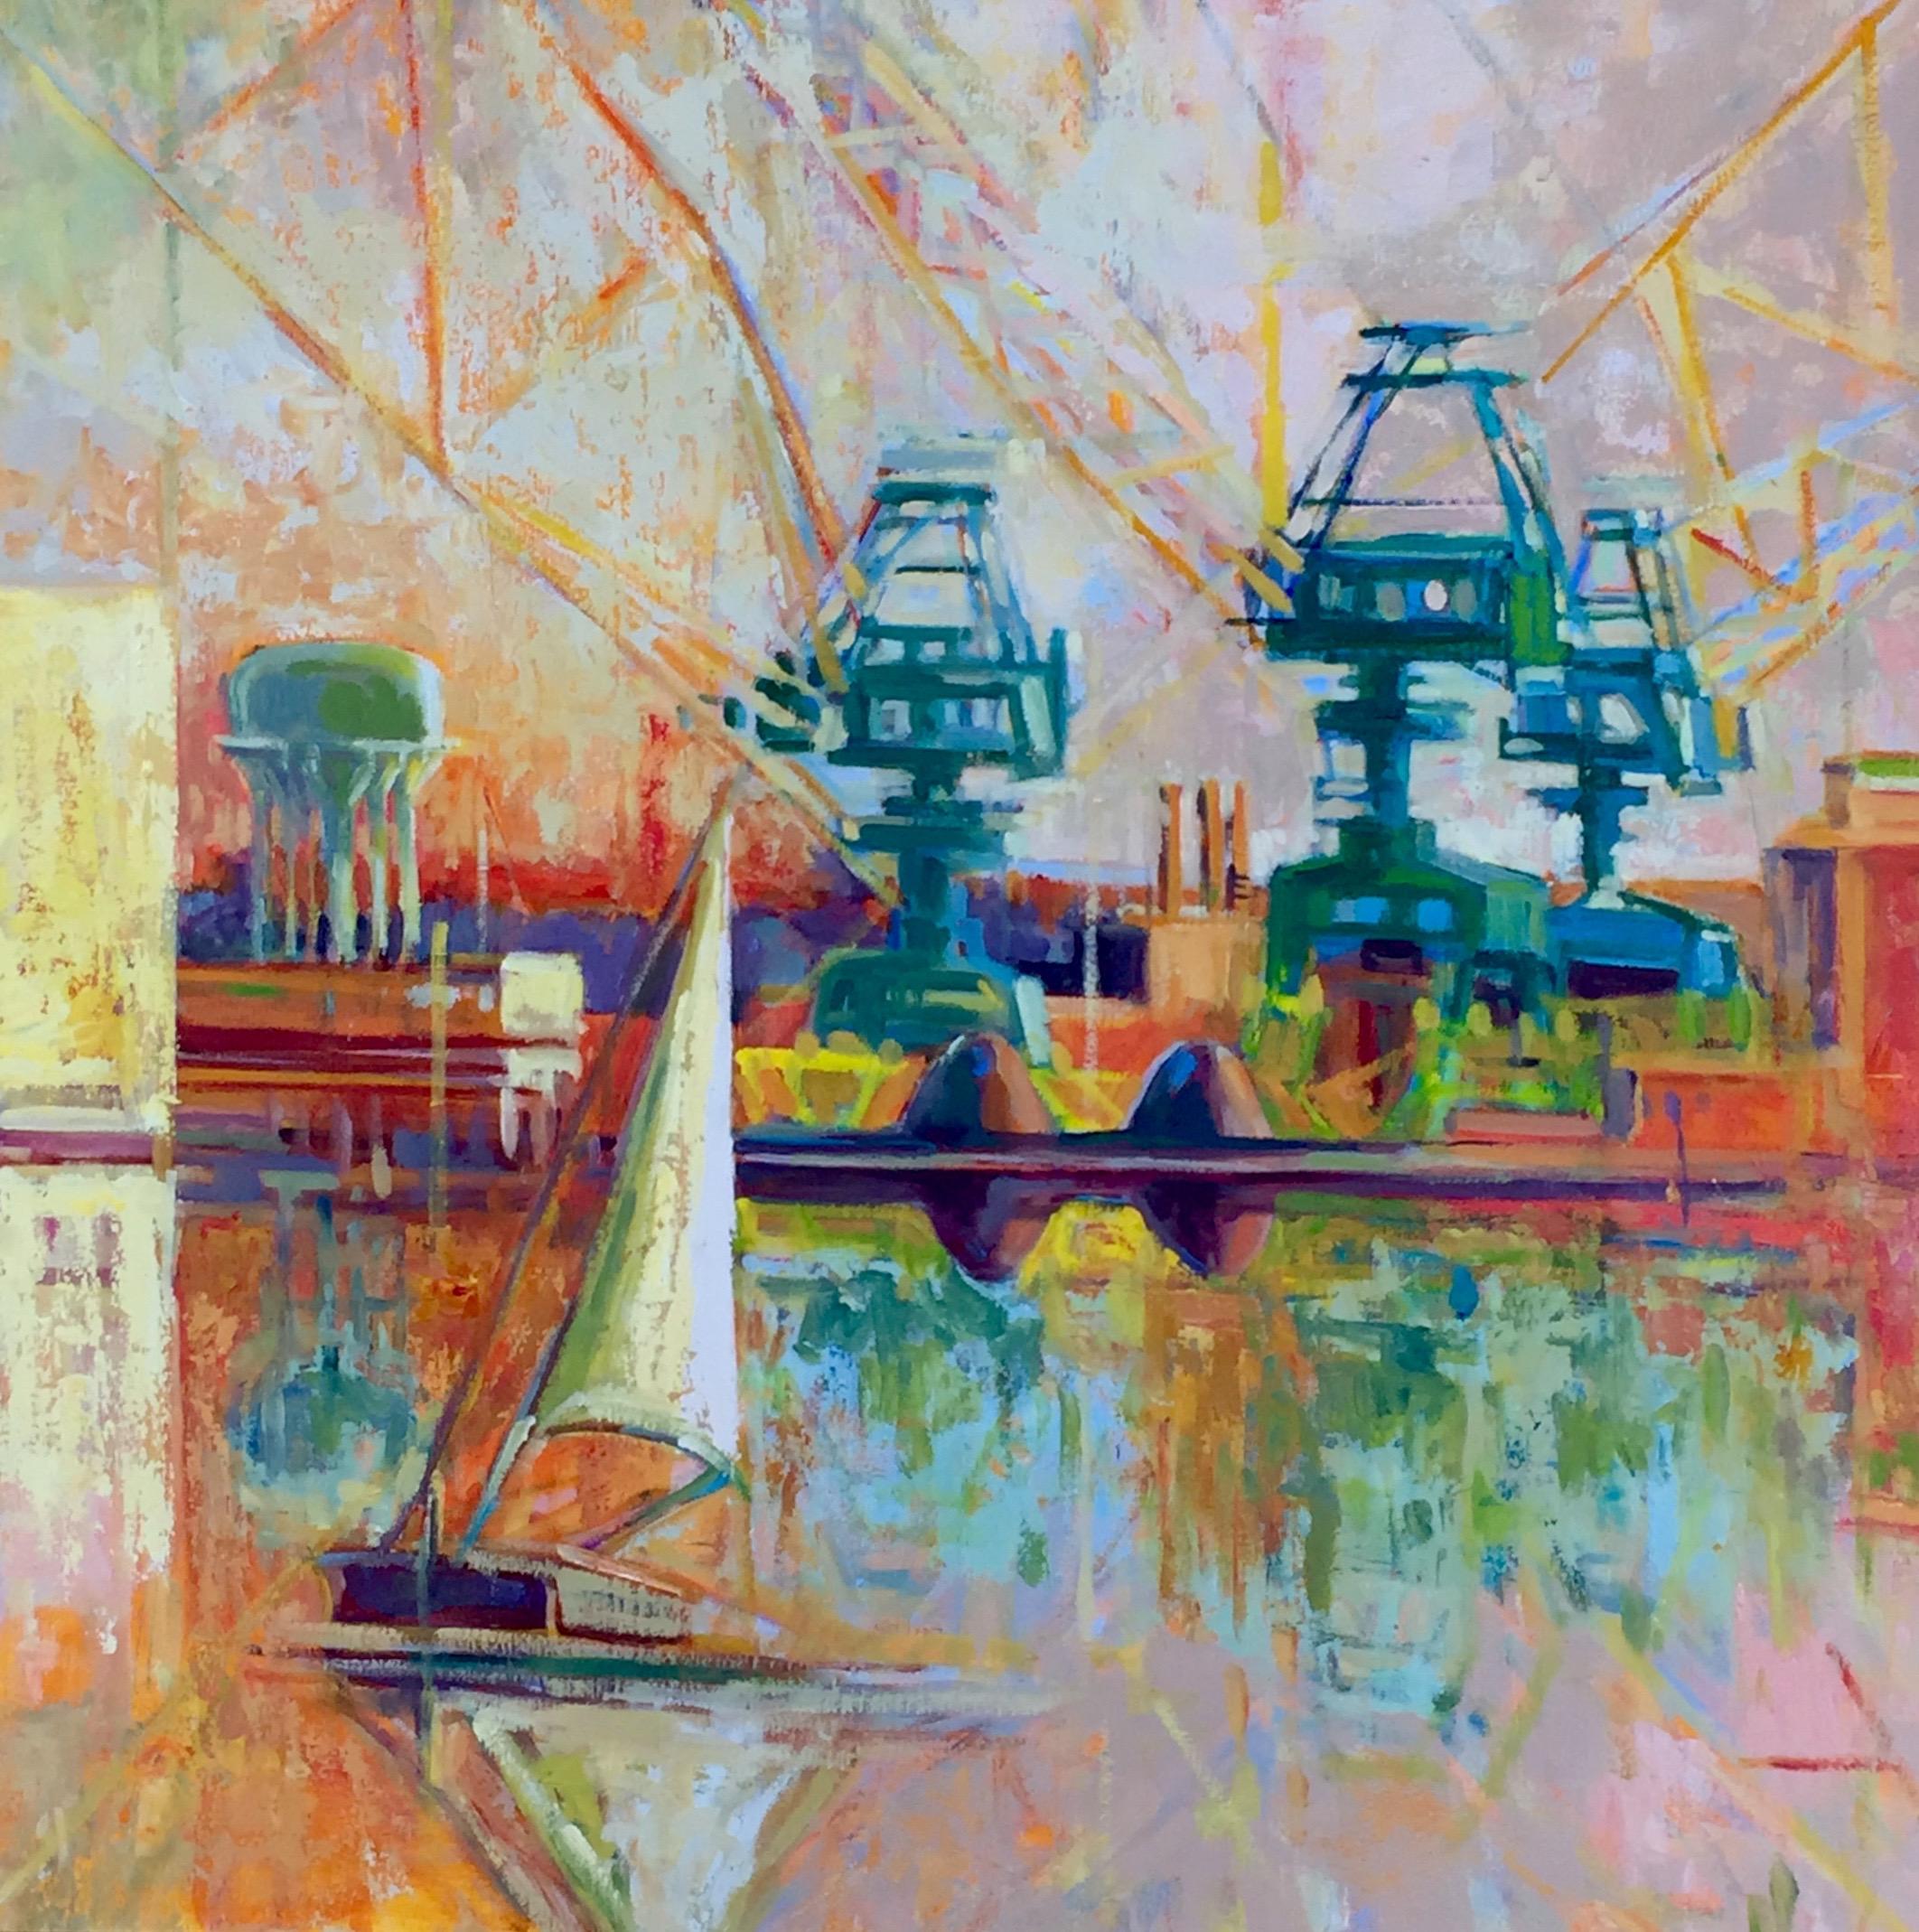 Port to Portal, oils, 32 x 32